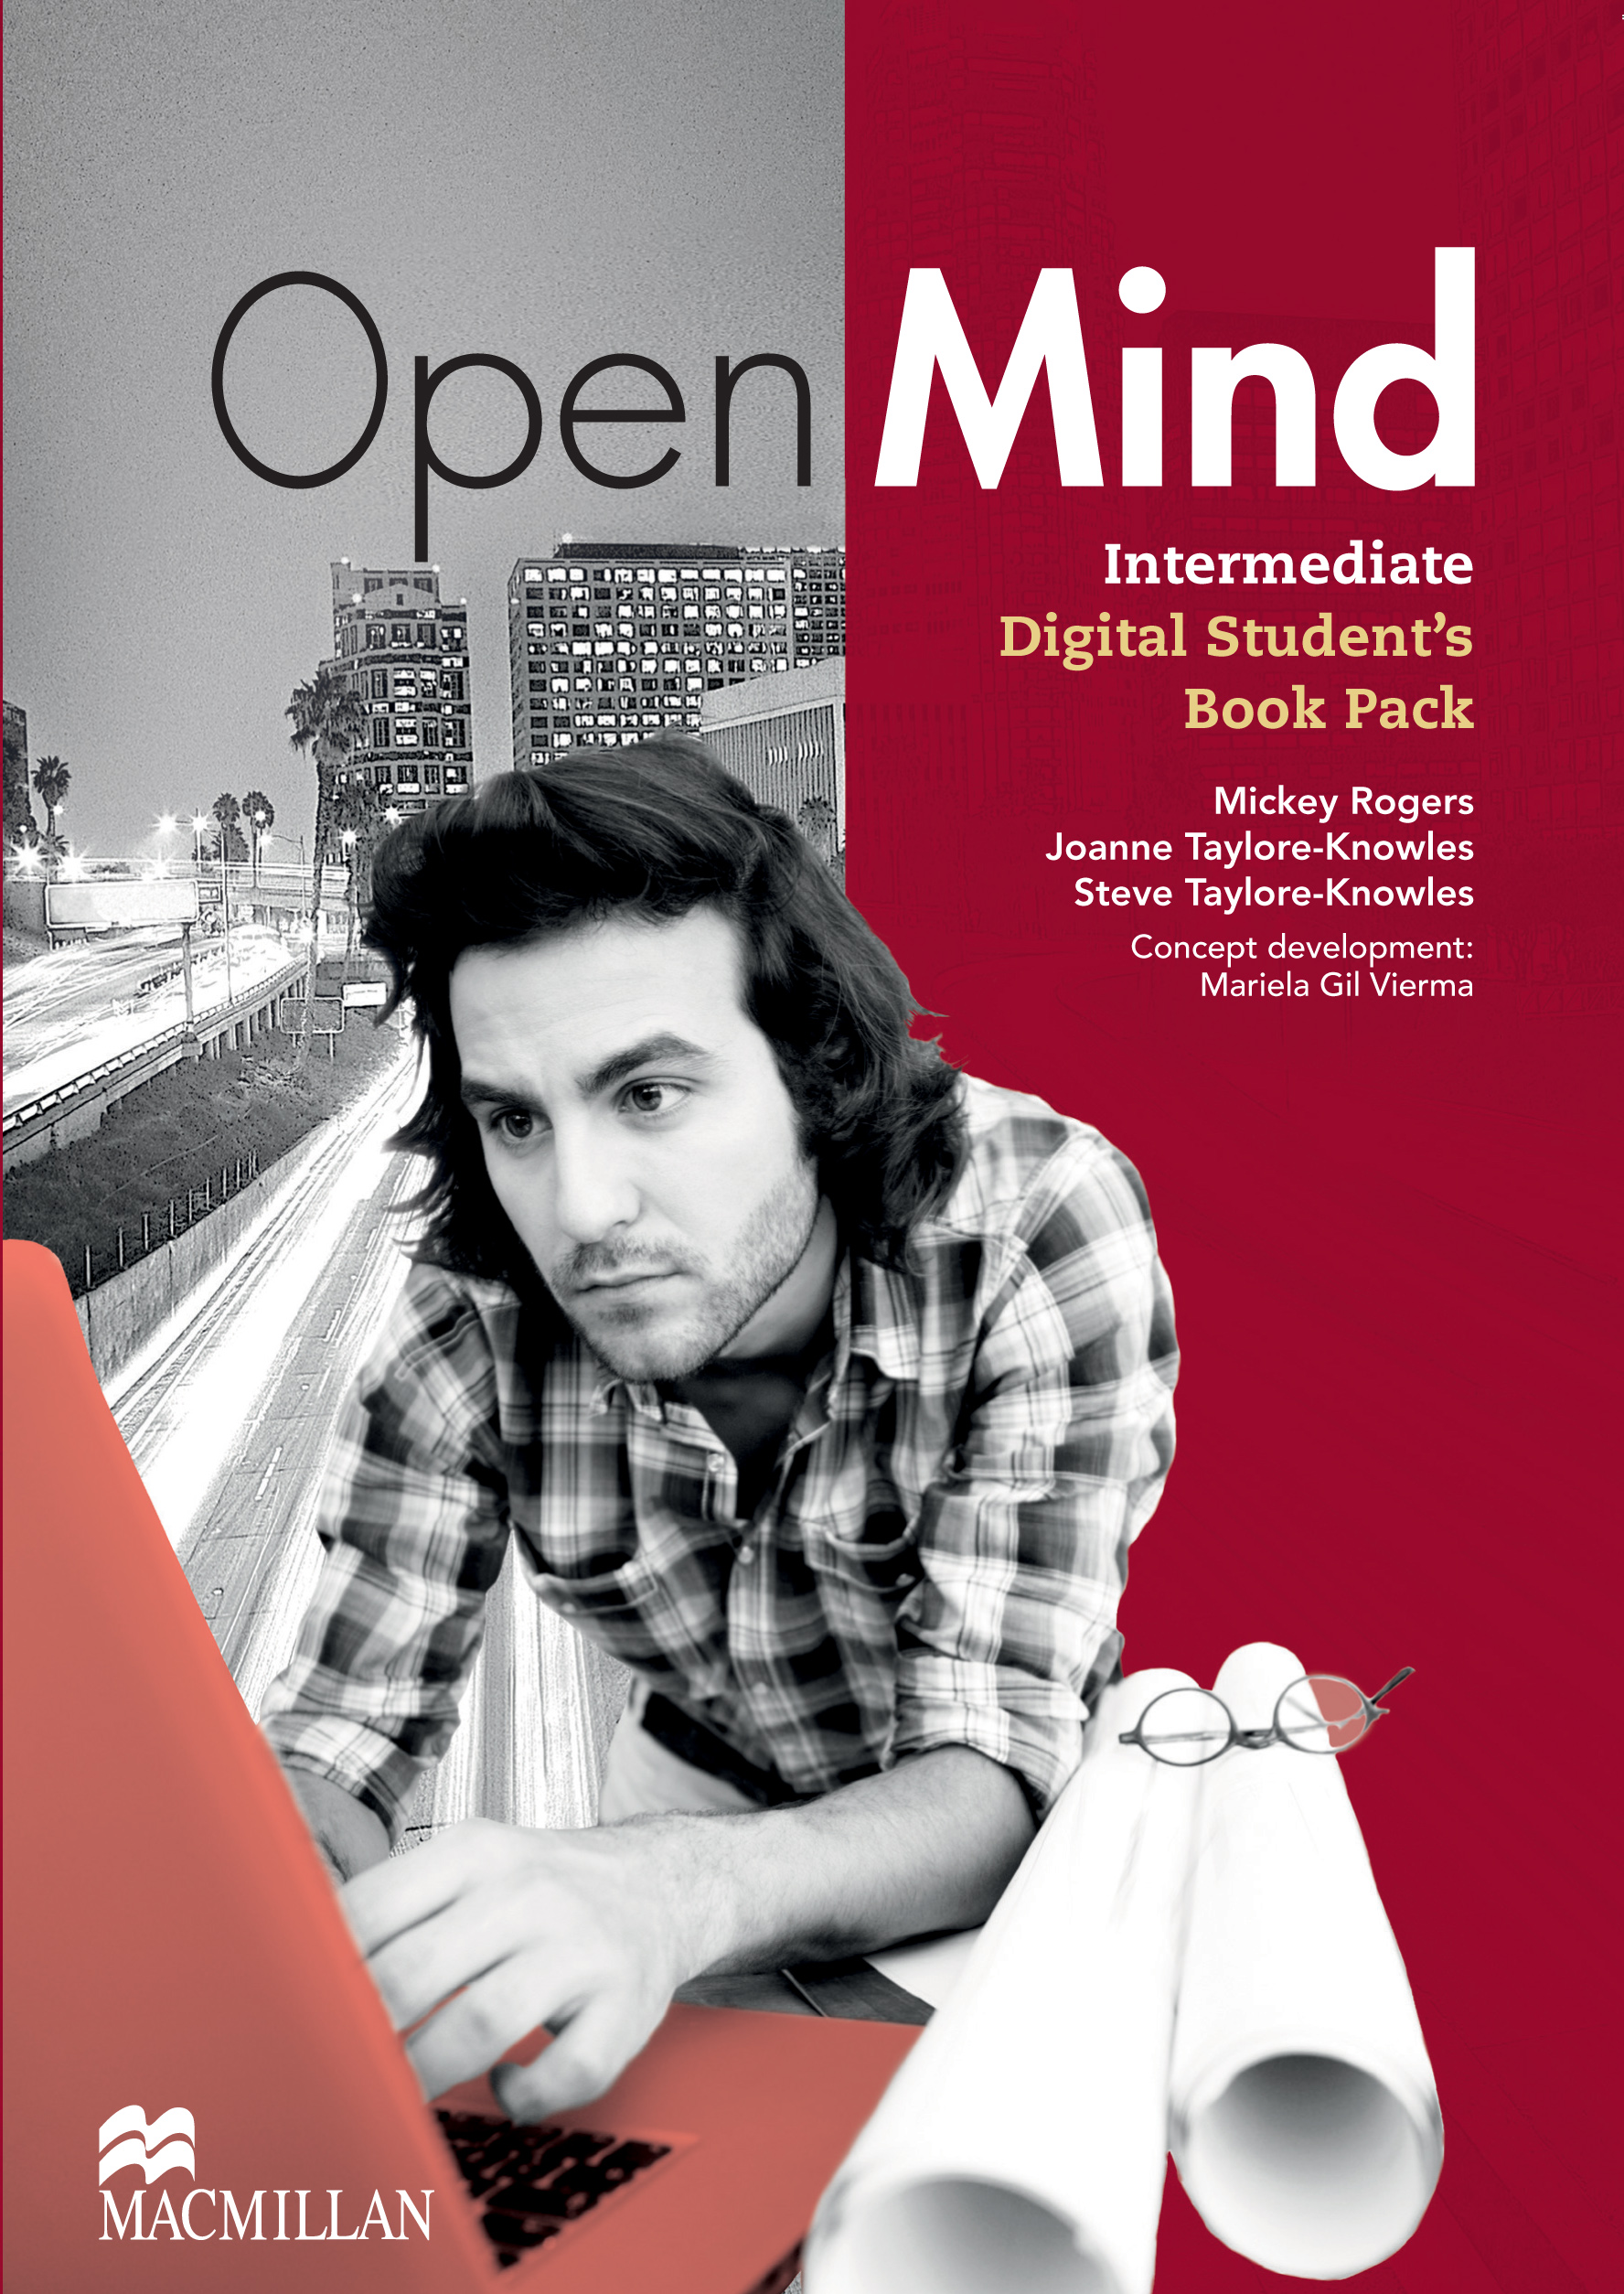 Open Mind Intermediate Digital Student